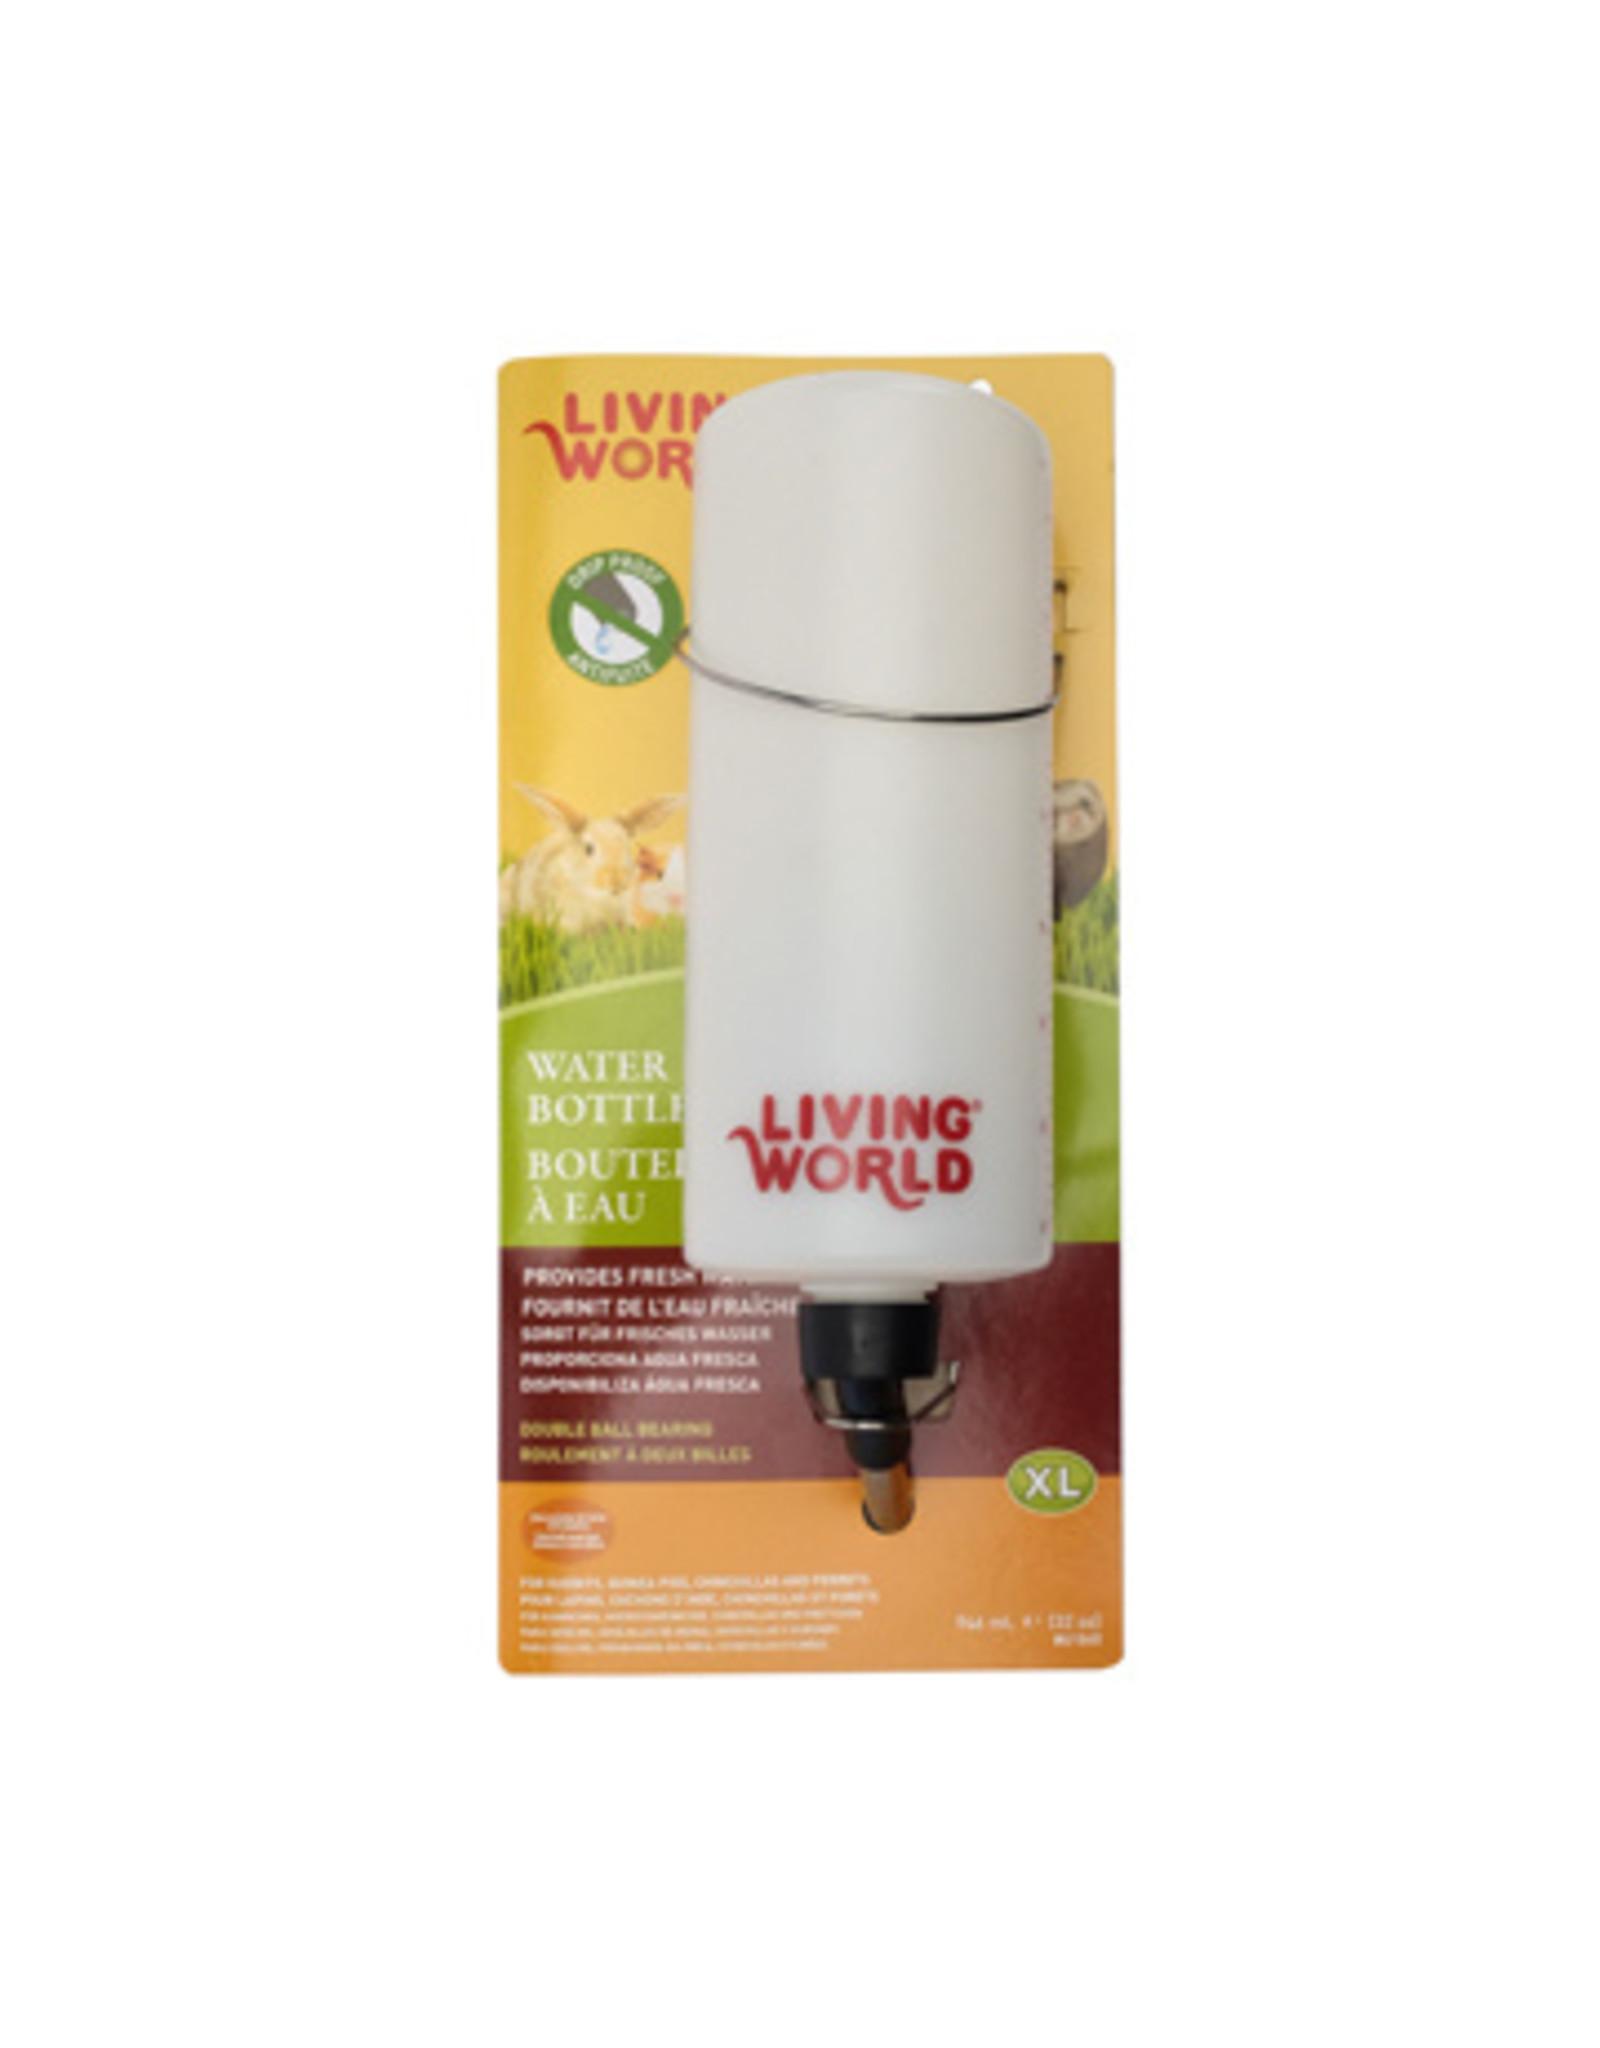 Living World LIVING WORLD Leakproof Water Bottle